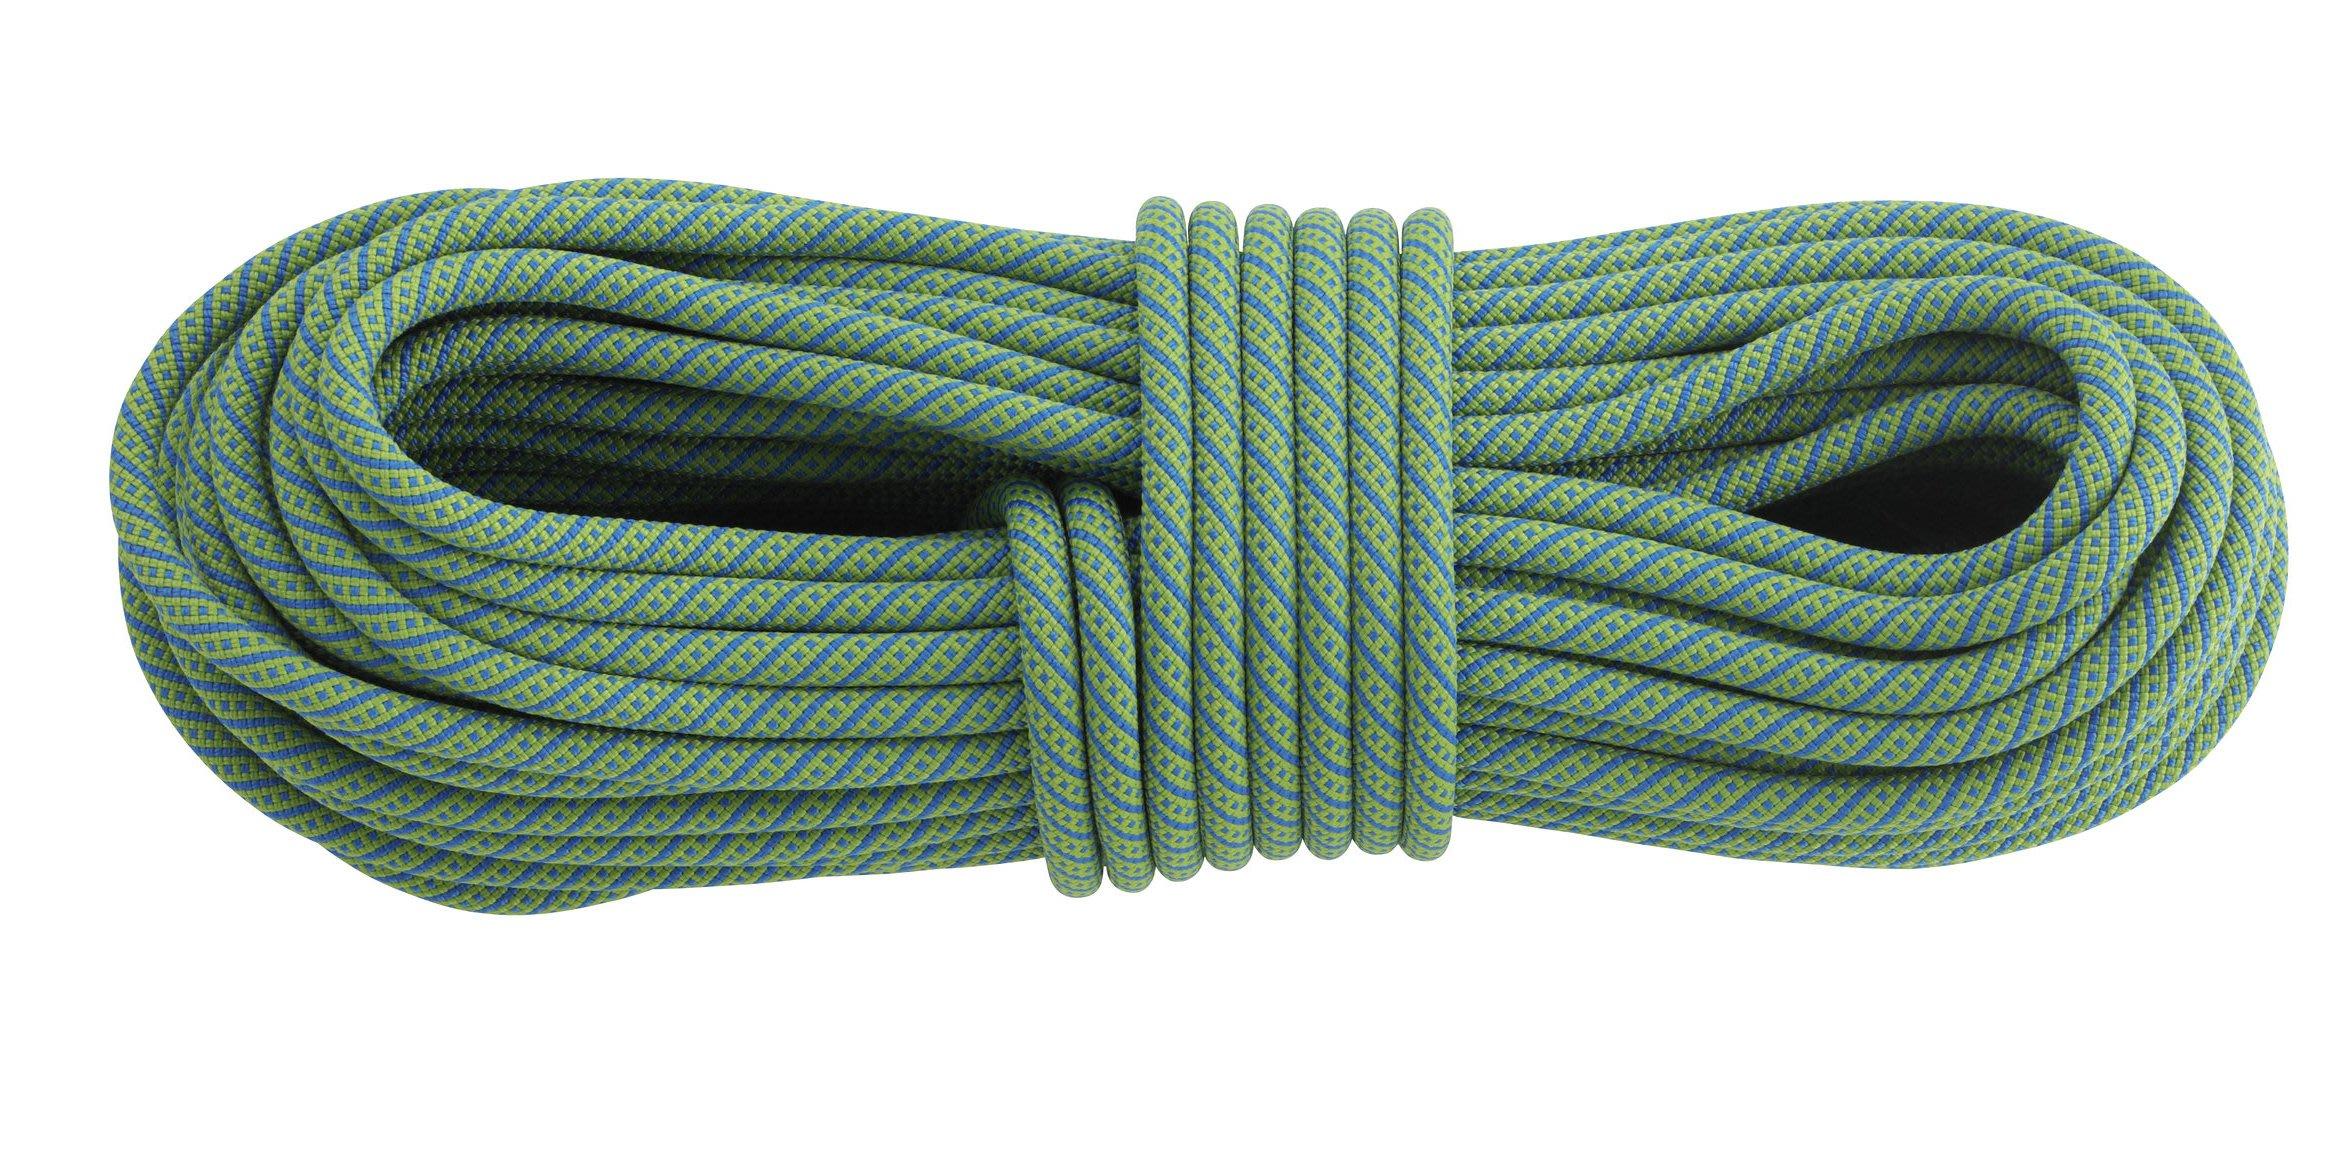 奧地利 AUSTRIALPIN HARD.ROCK 9.8 single rope 動力繩 9.8mm